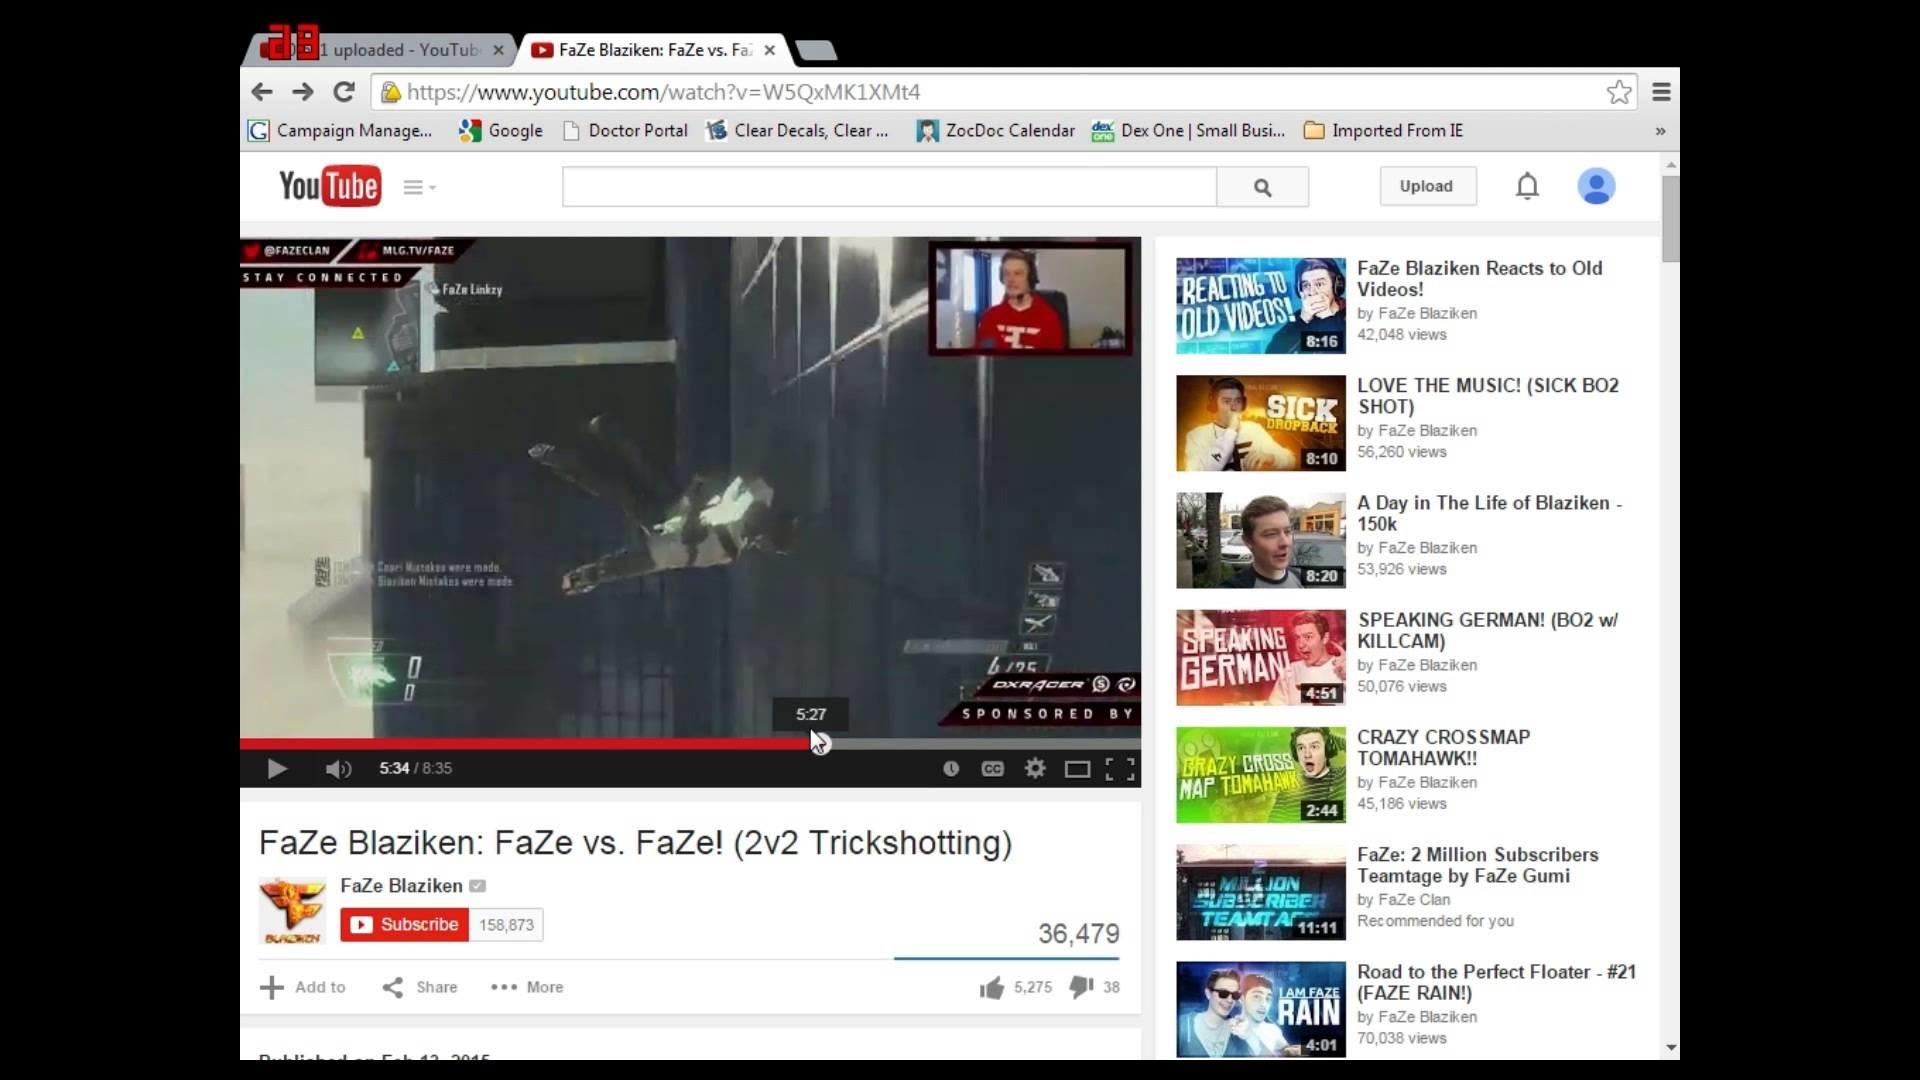 FaZe Carl FaZe Rug and FaZe Linkzy exposed for faking clips @FaZe Clan –  YouTube